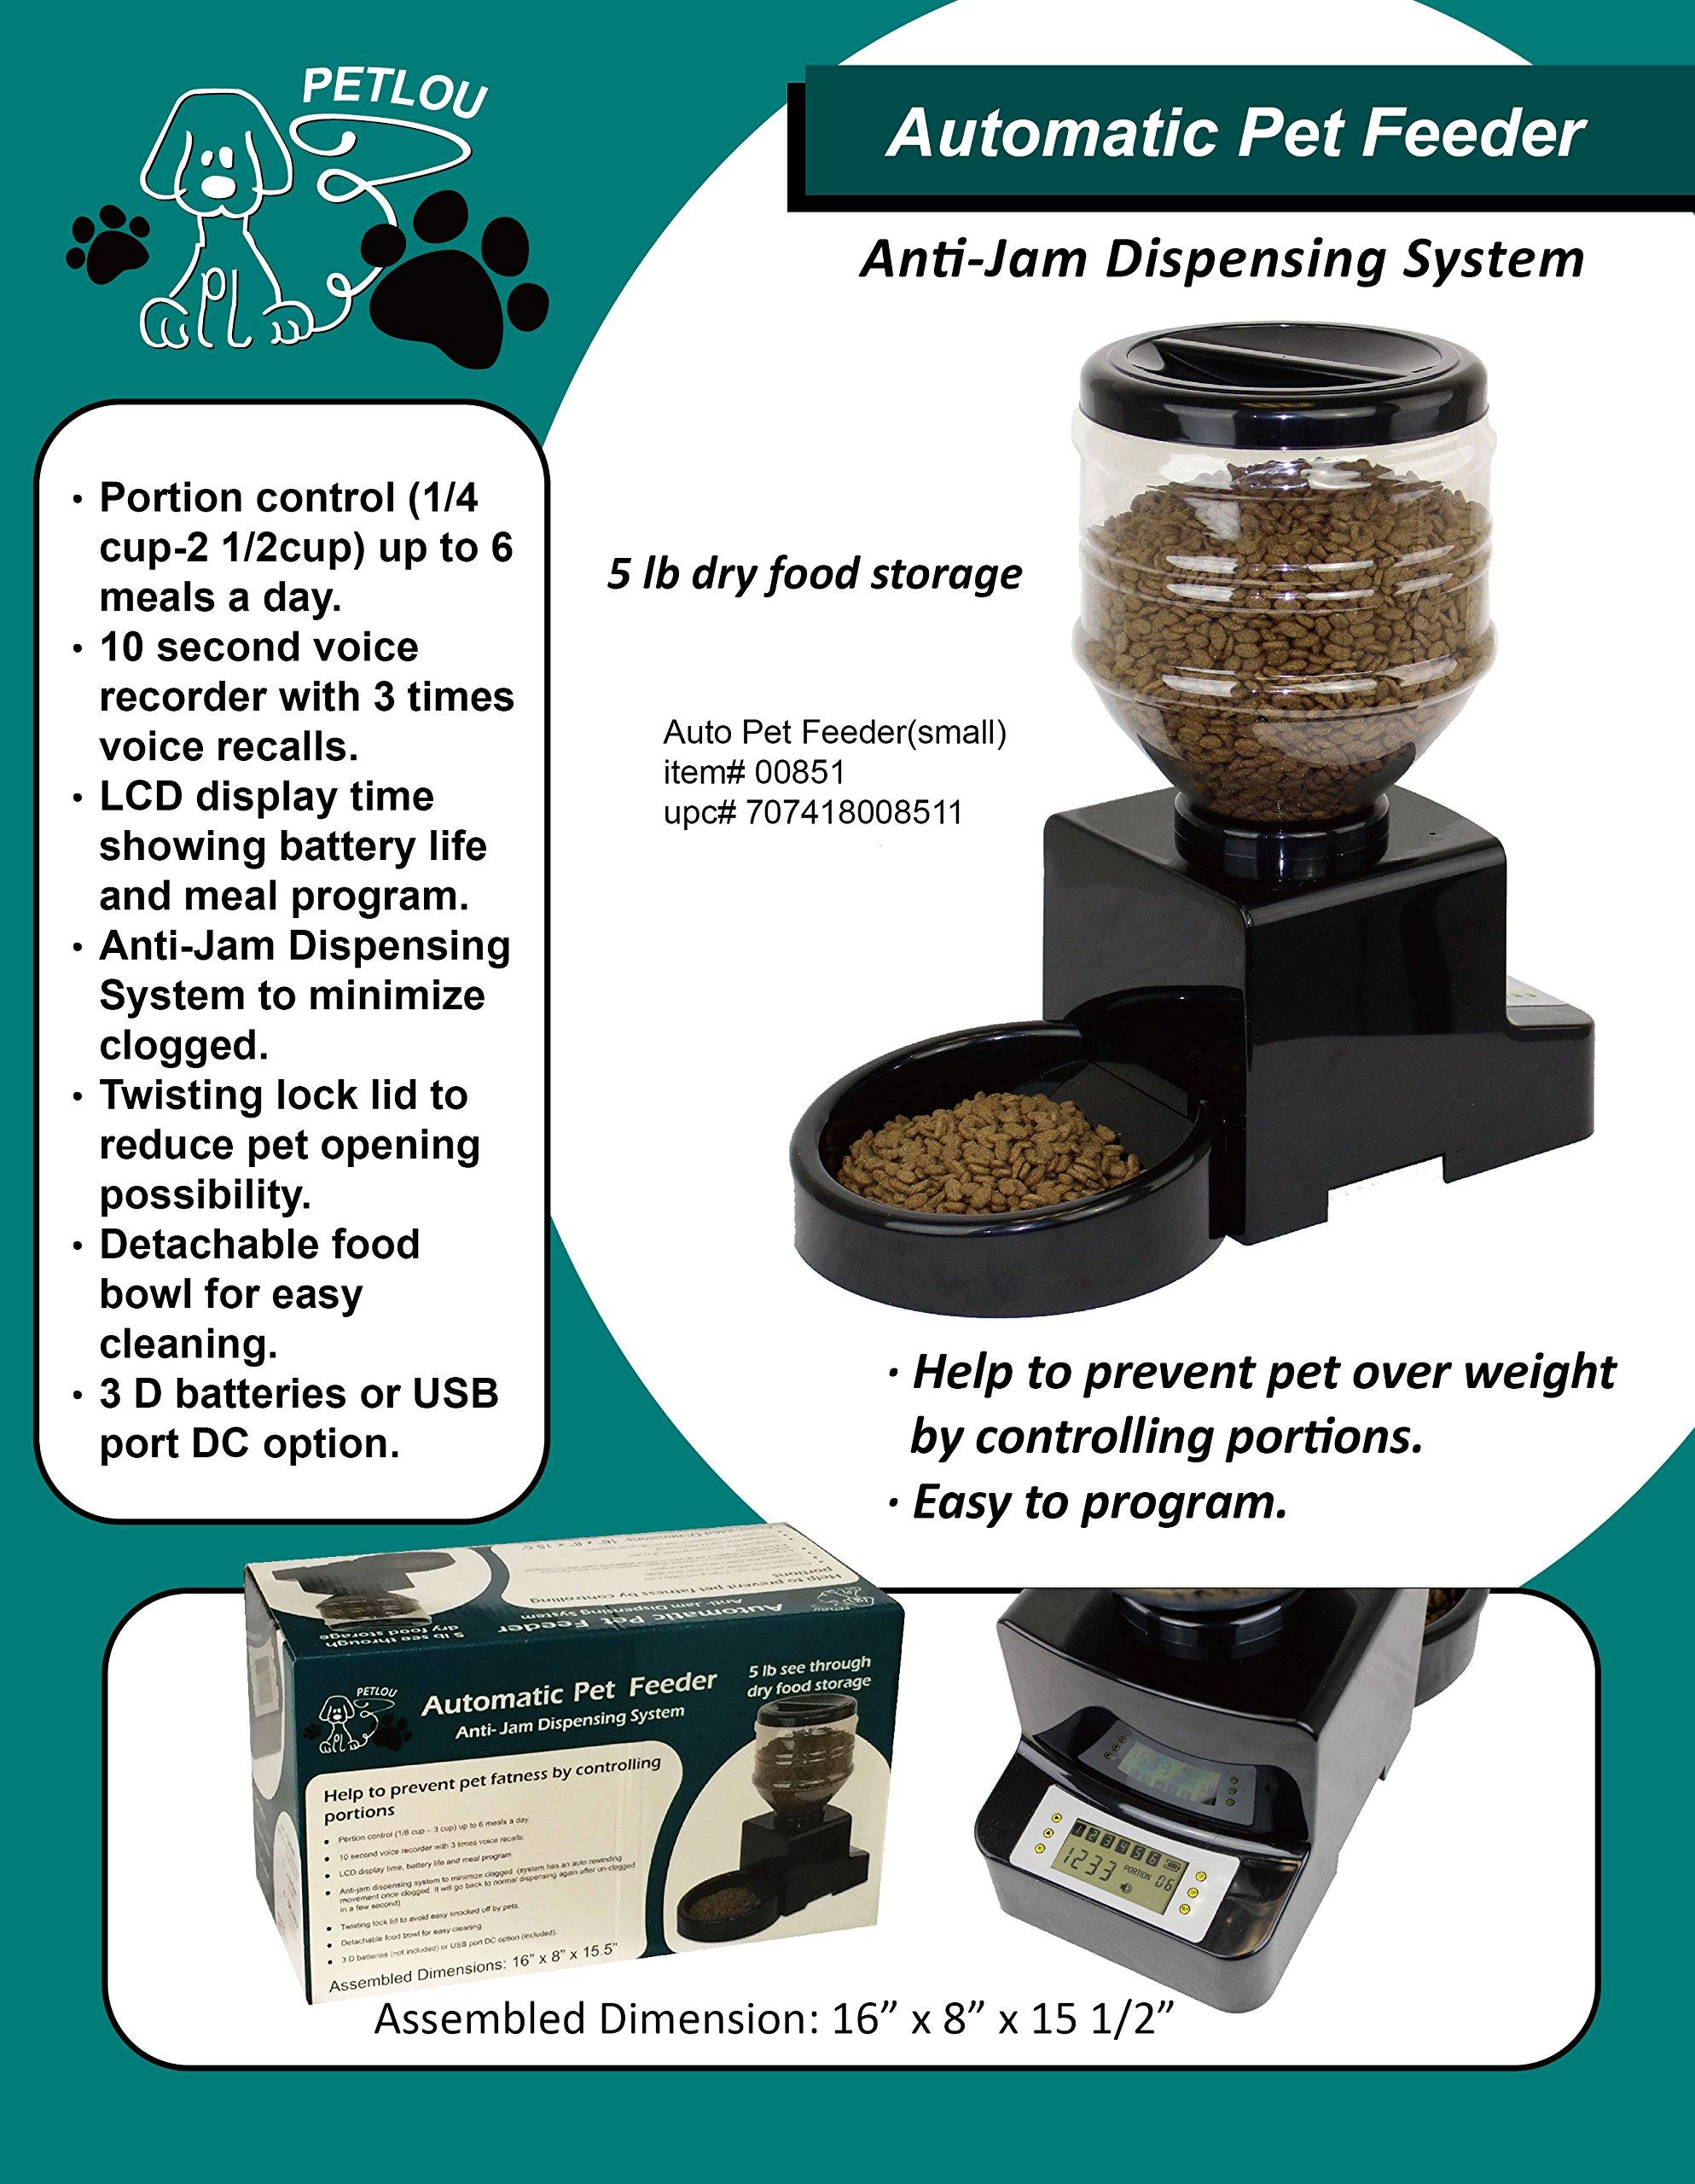 Petlou Automatic Pet Feeder with Anti-Jam Dispensing System